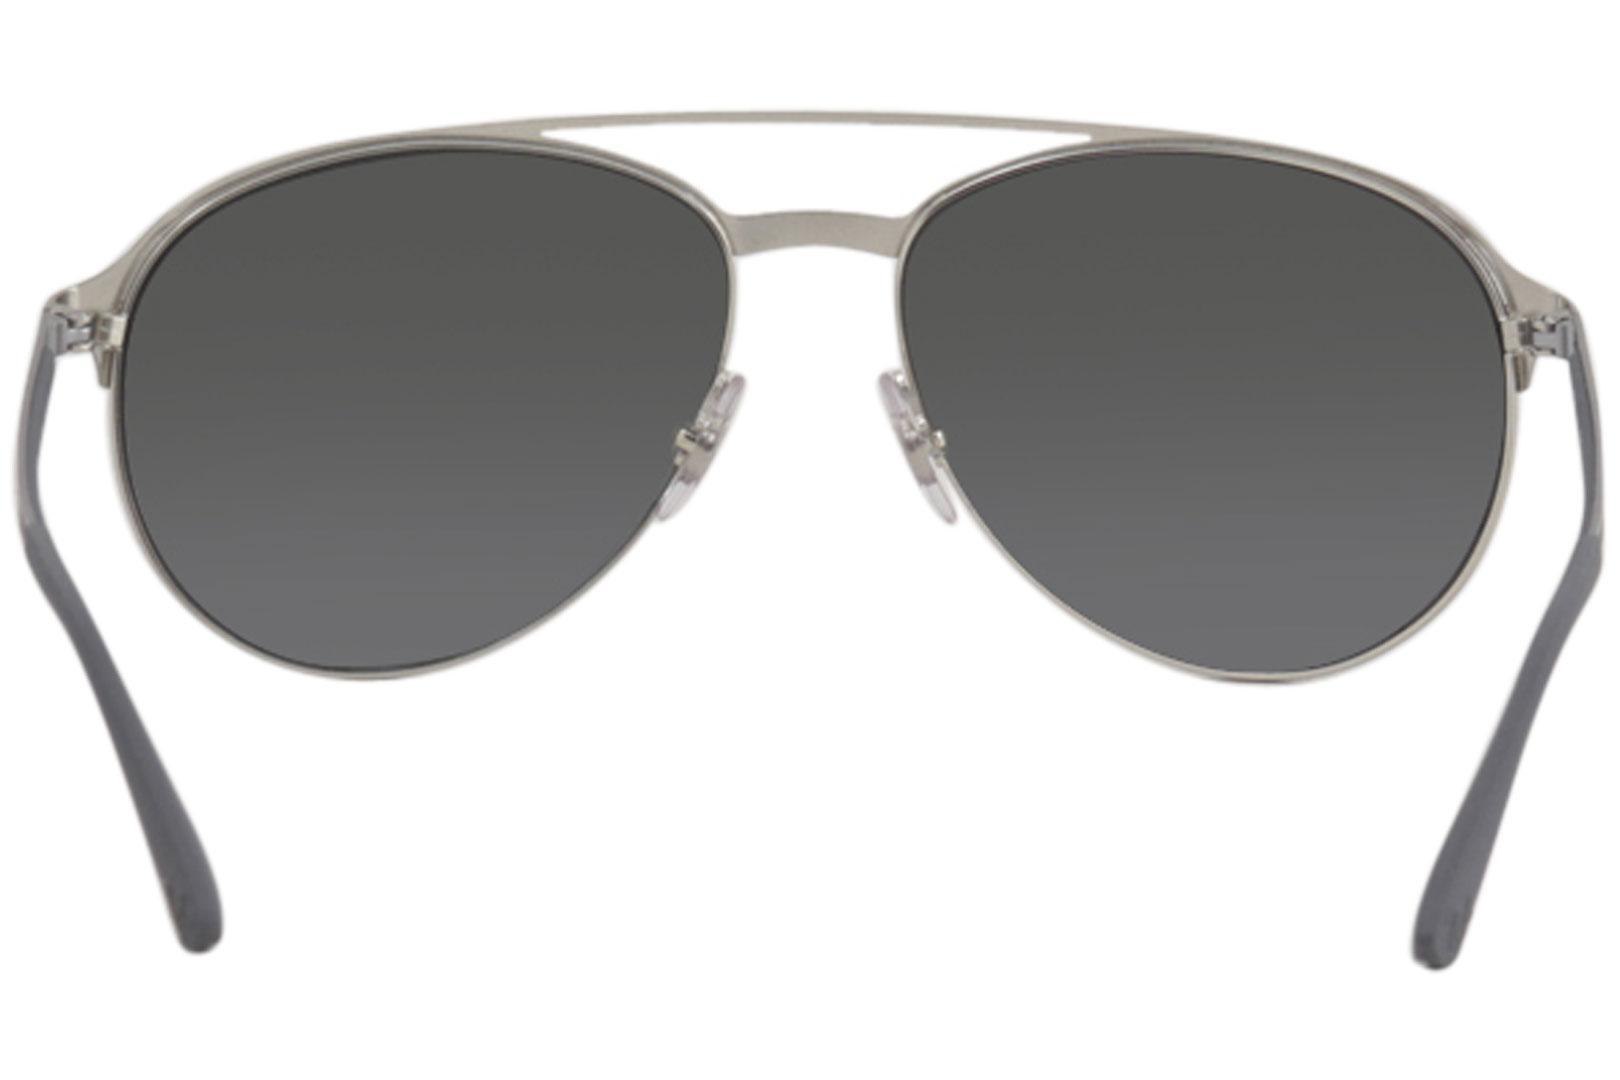 faba42c4b8 Ray Ban Men's RB3606 RB/3606 RayBan Fashion Pilot Sunglasses by Ray Ban